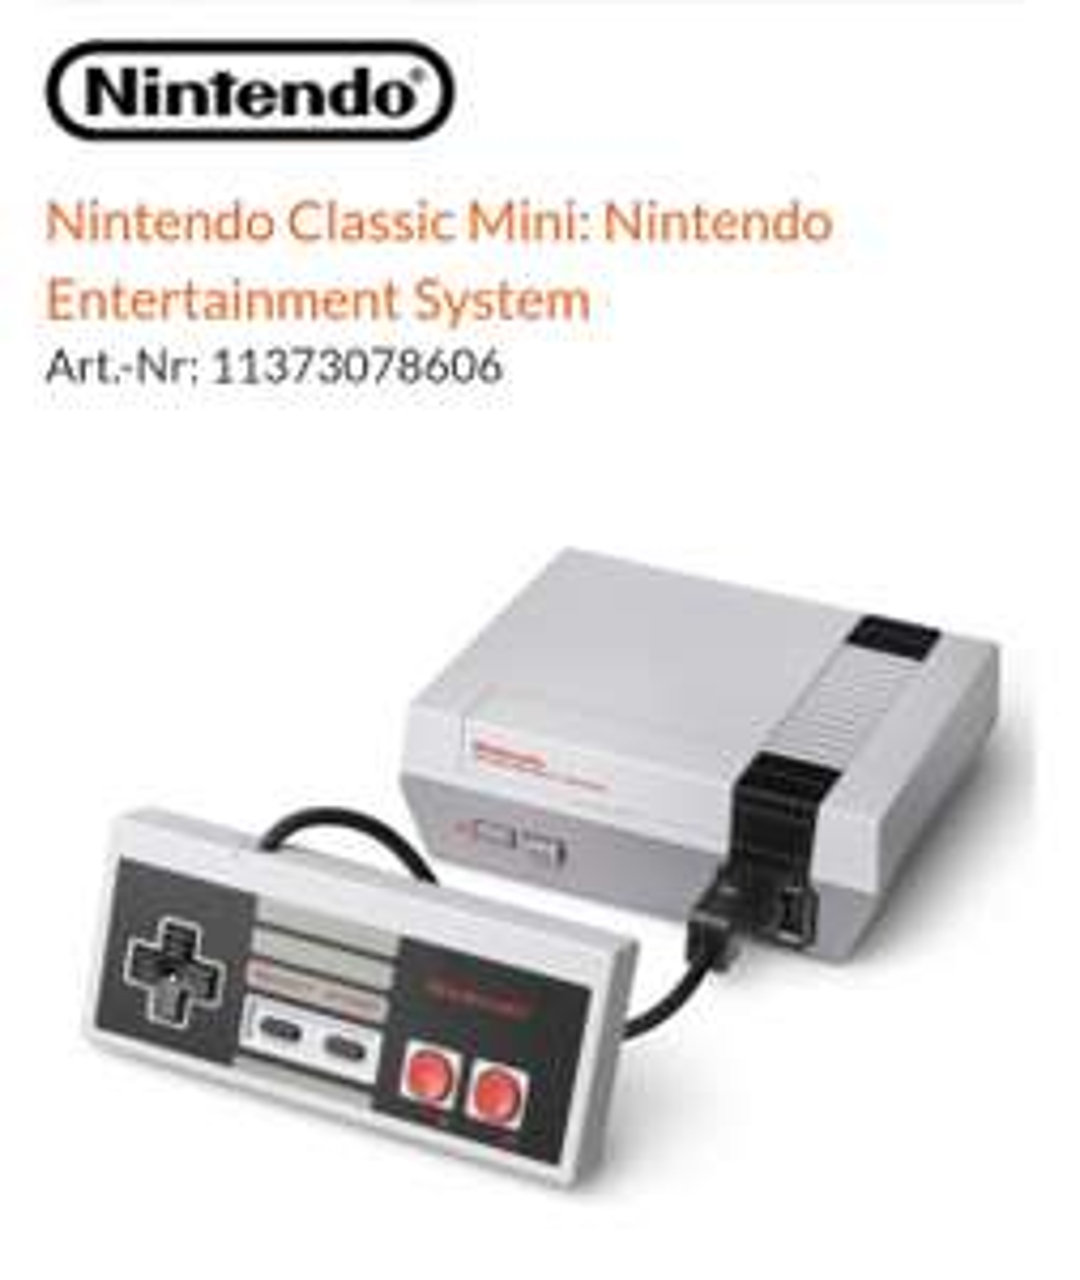 NINTENDO CLASSIC MINI NES [EXPERT Bundesweit Versand 3,99€]